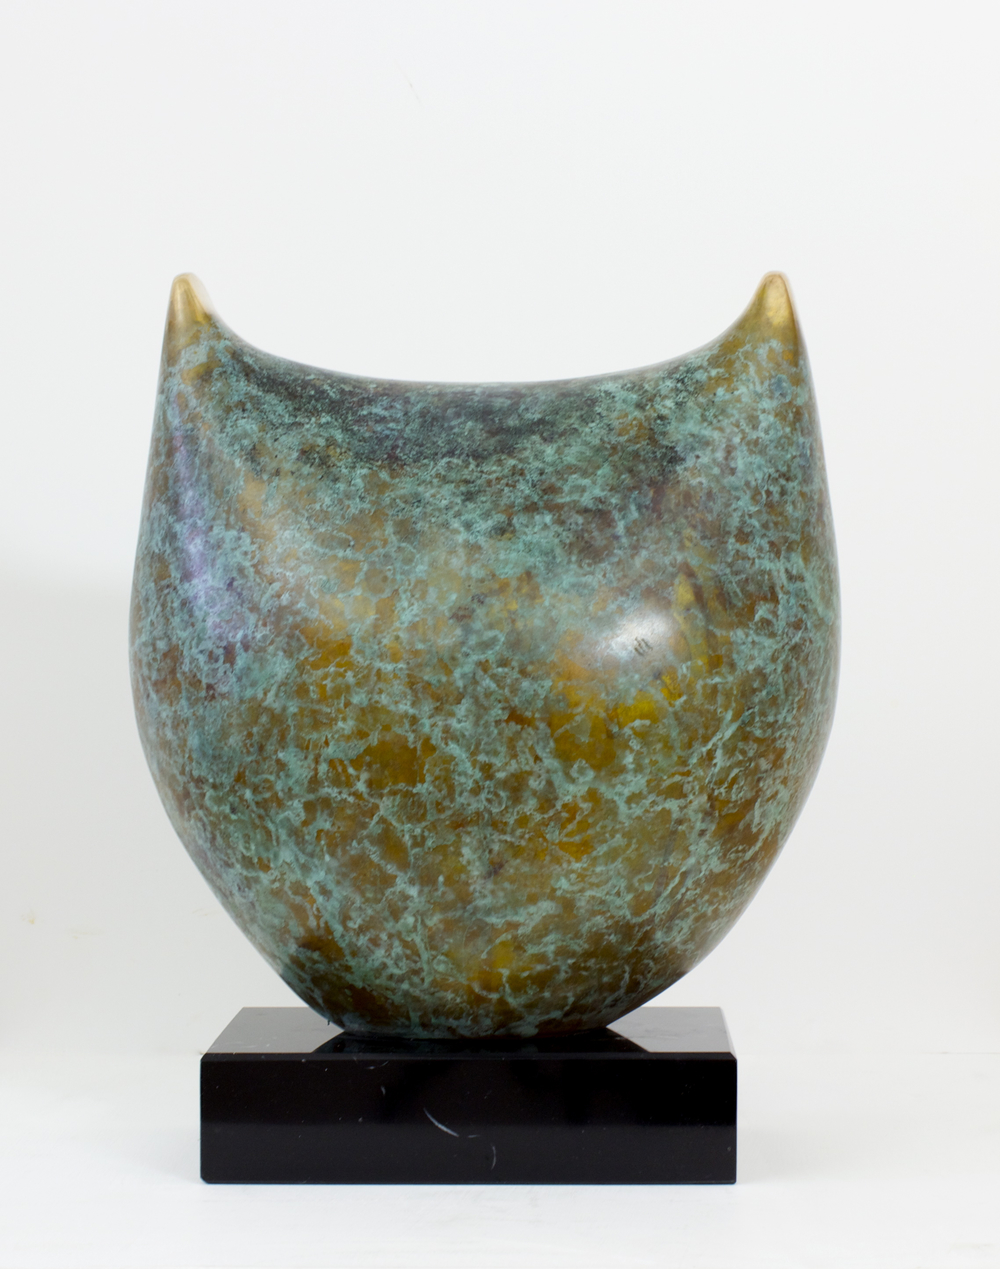 Sonja Landweer_-_Alert_bronze_31 x 28 x 19cm_€5900.jpg